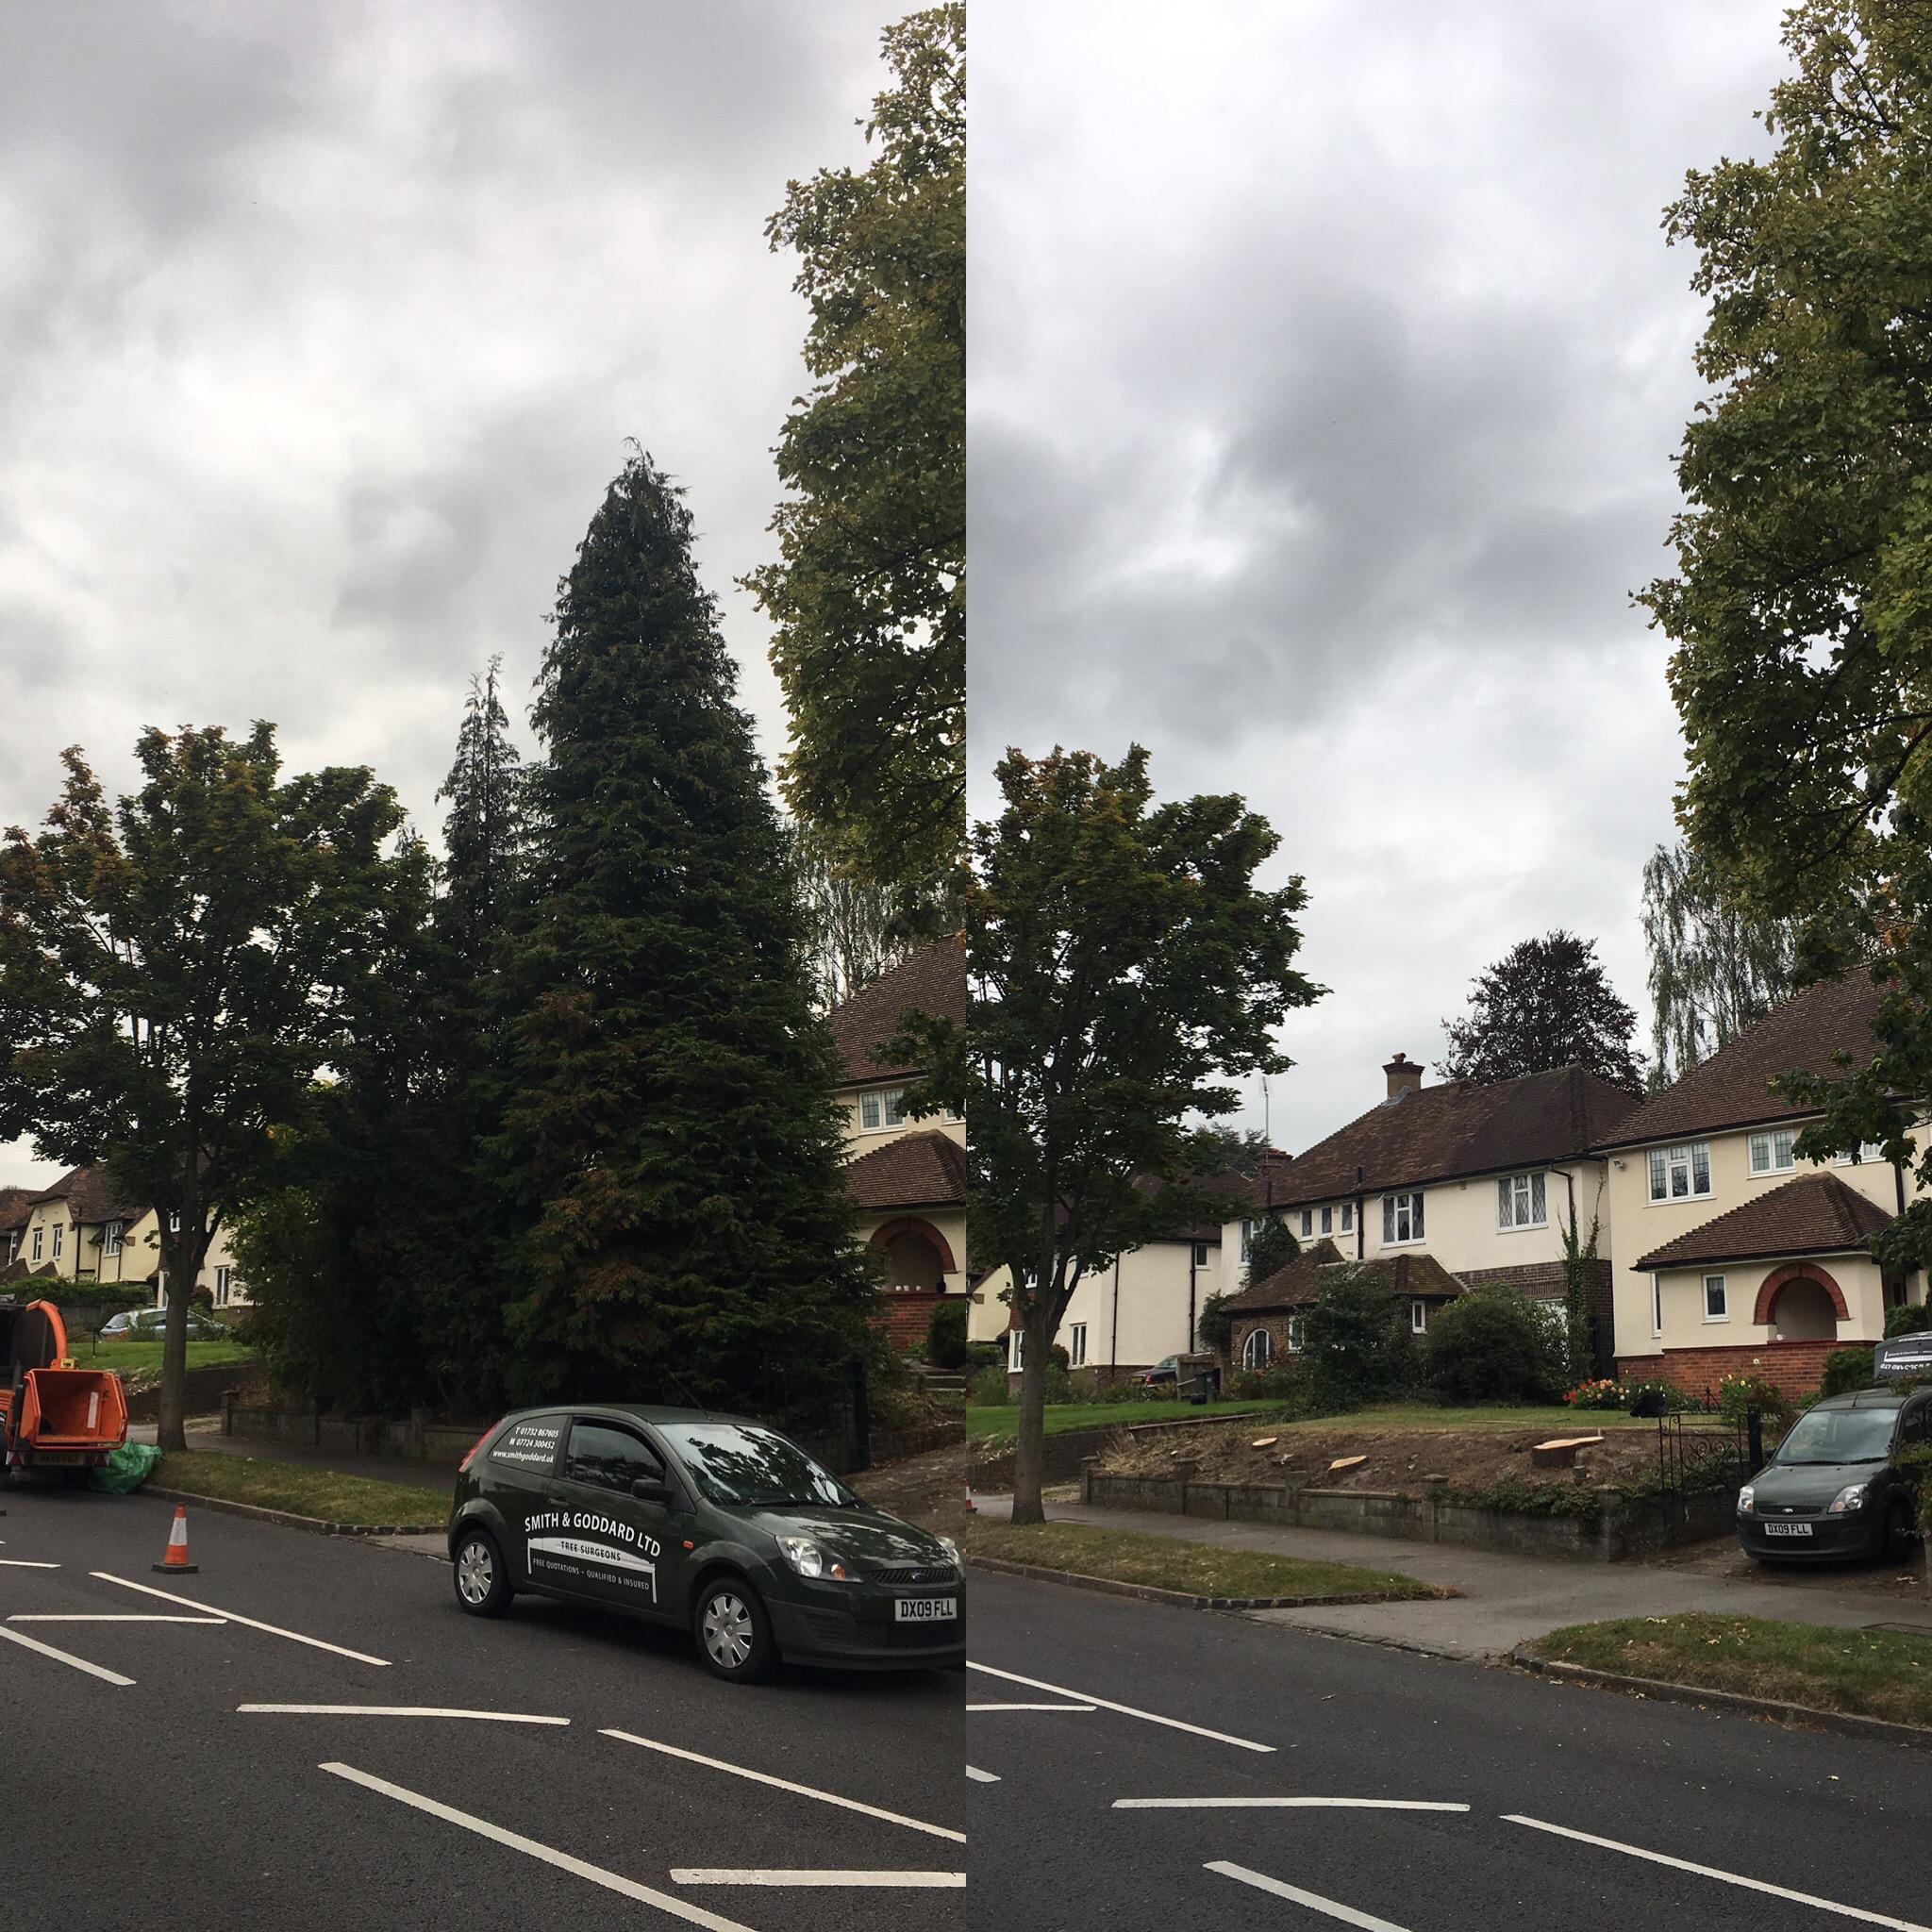 tree-dismantel-felling4.jpg